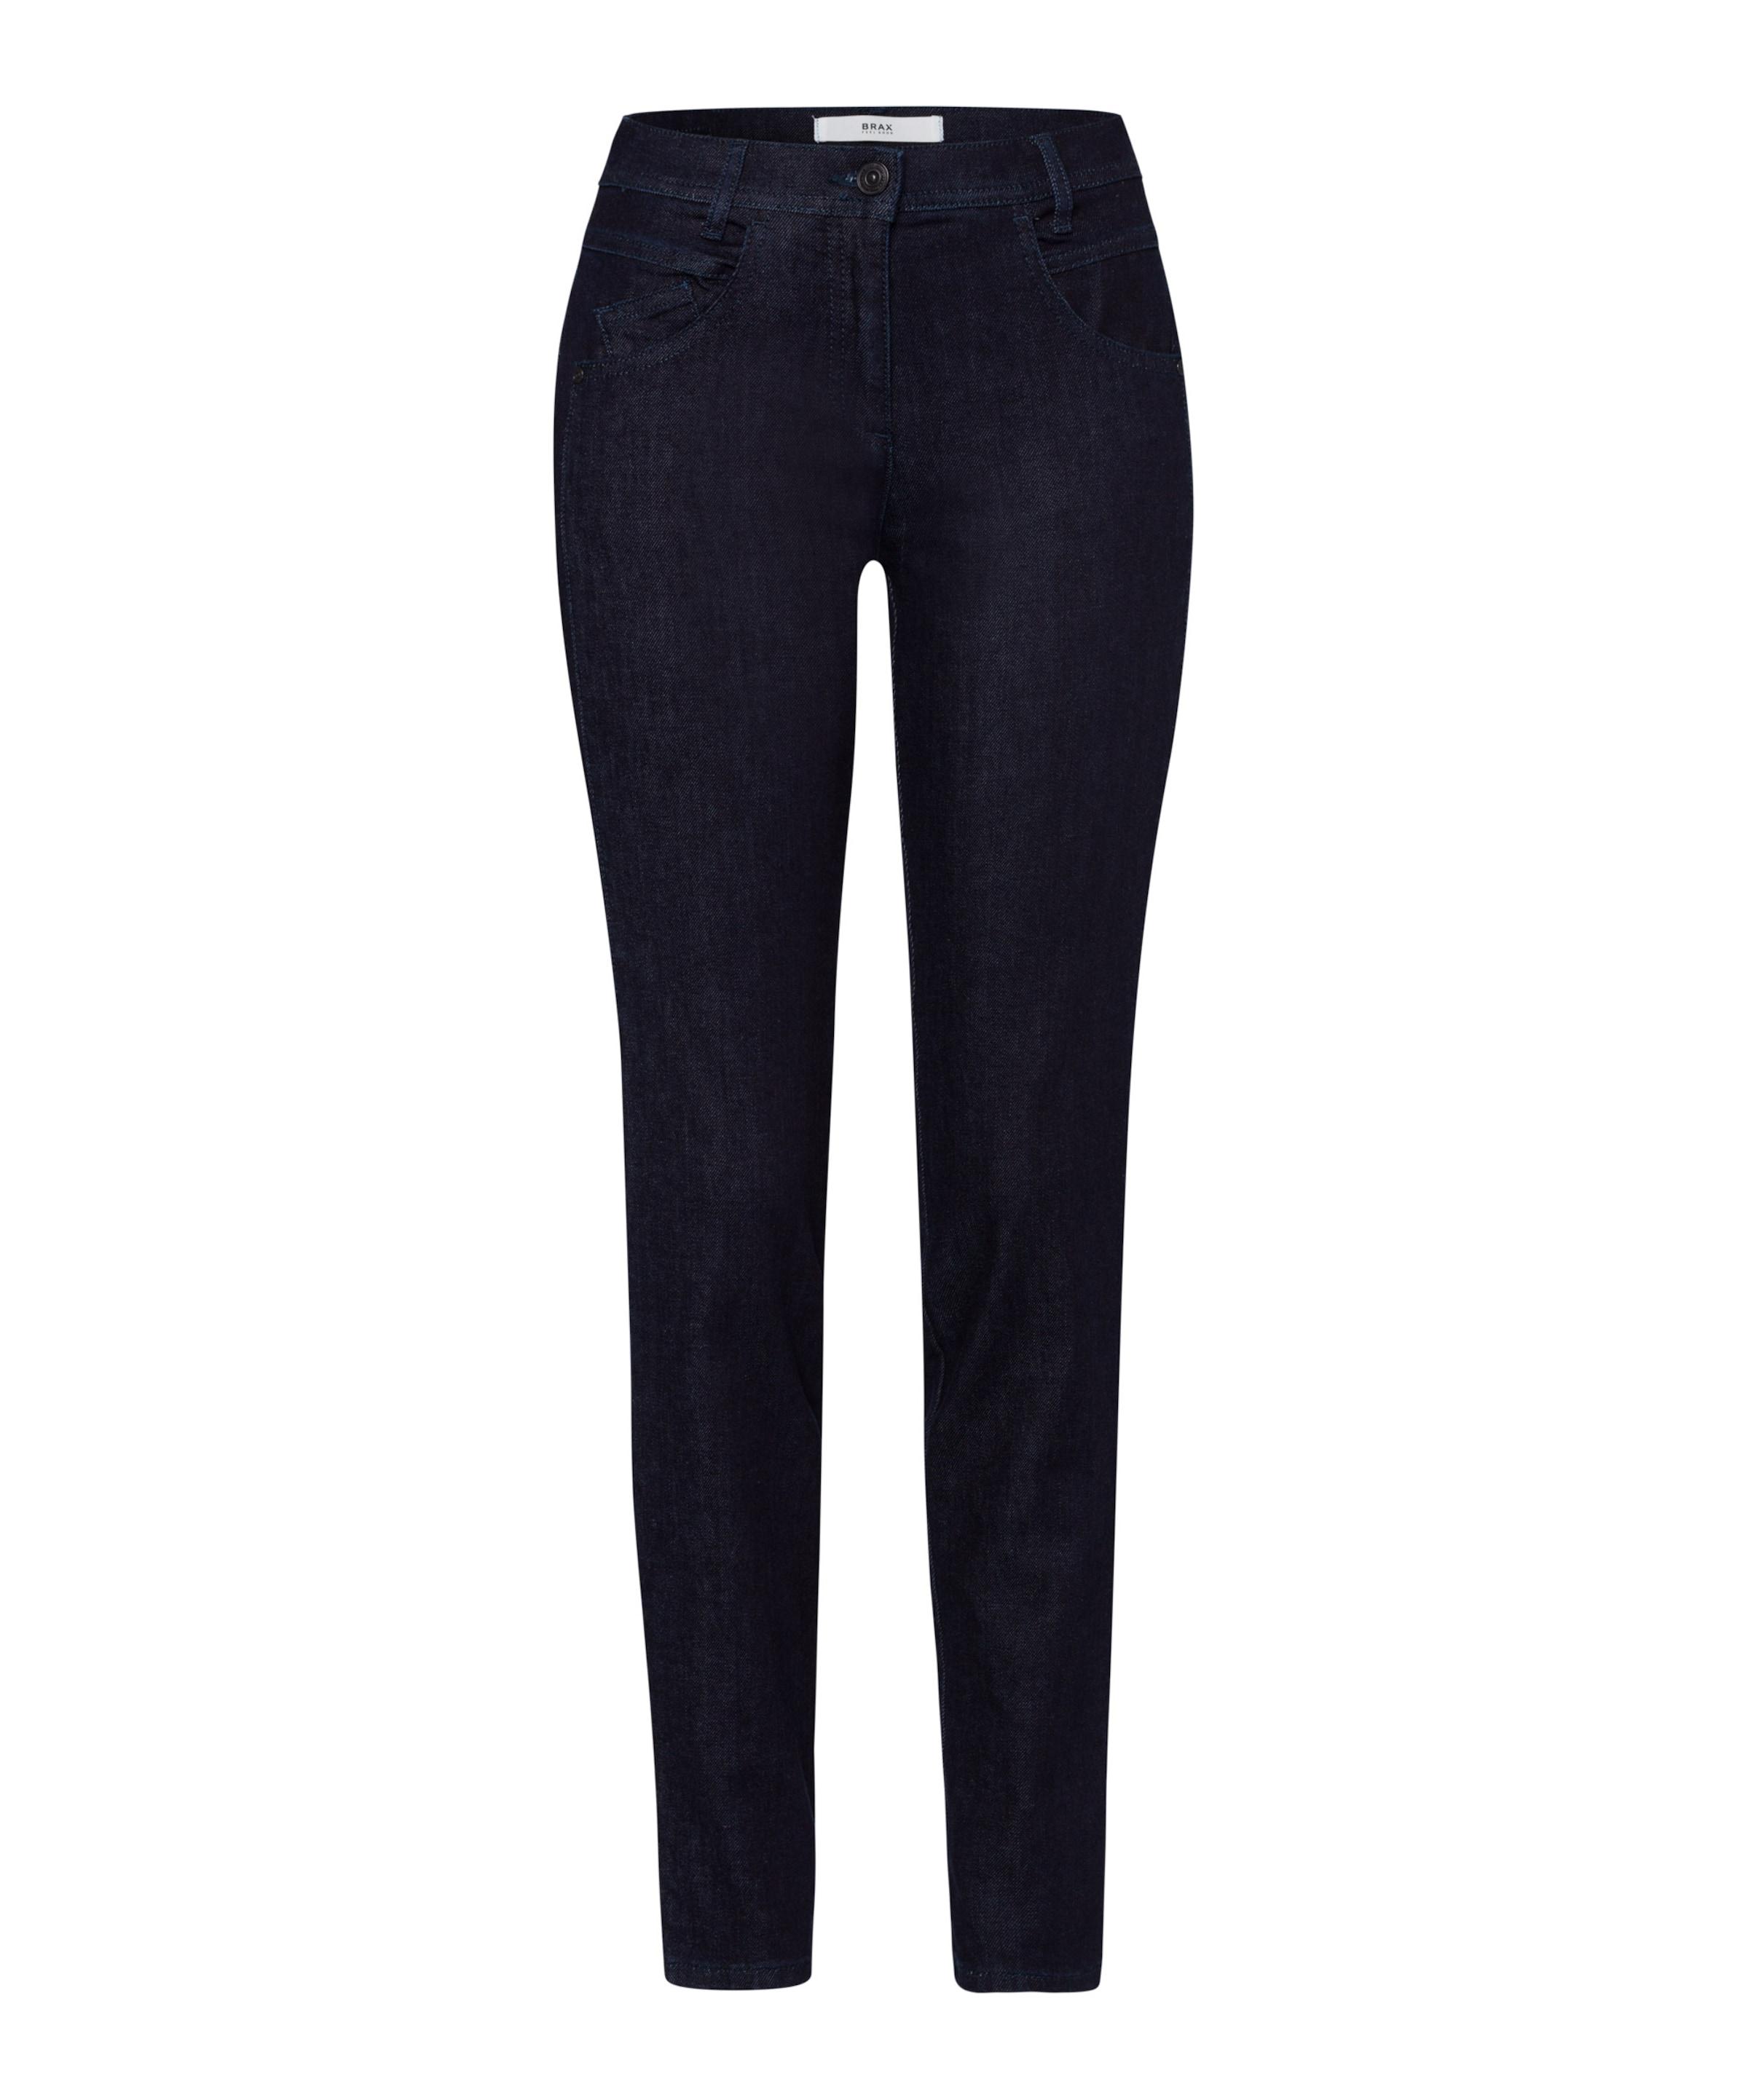 Brax Brax 'shakira' Jeans 'shakira' Dunkelblau Jeans In 6gvmfY7Iby